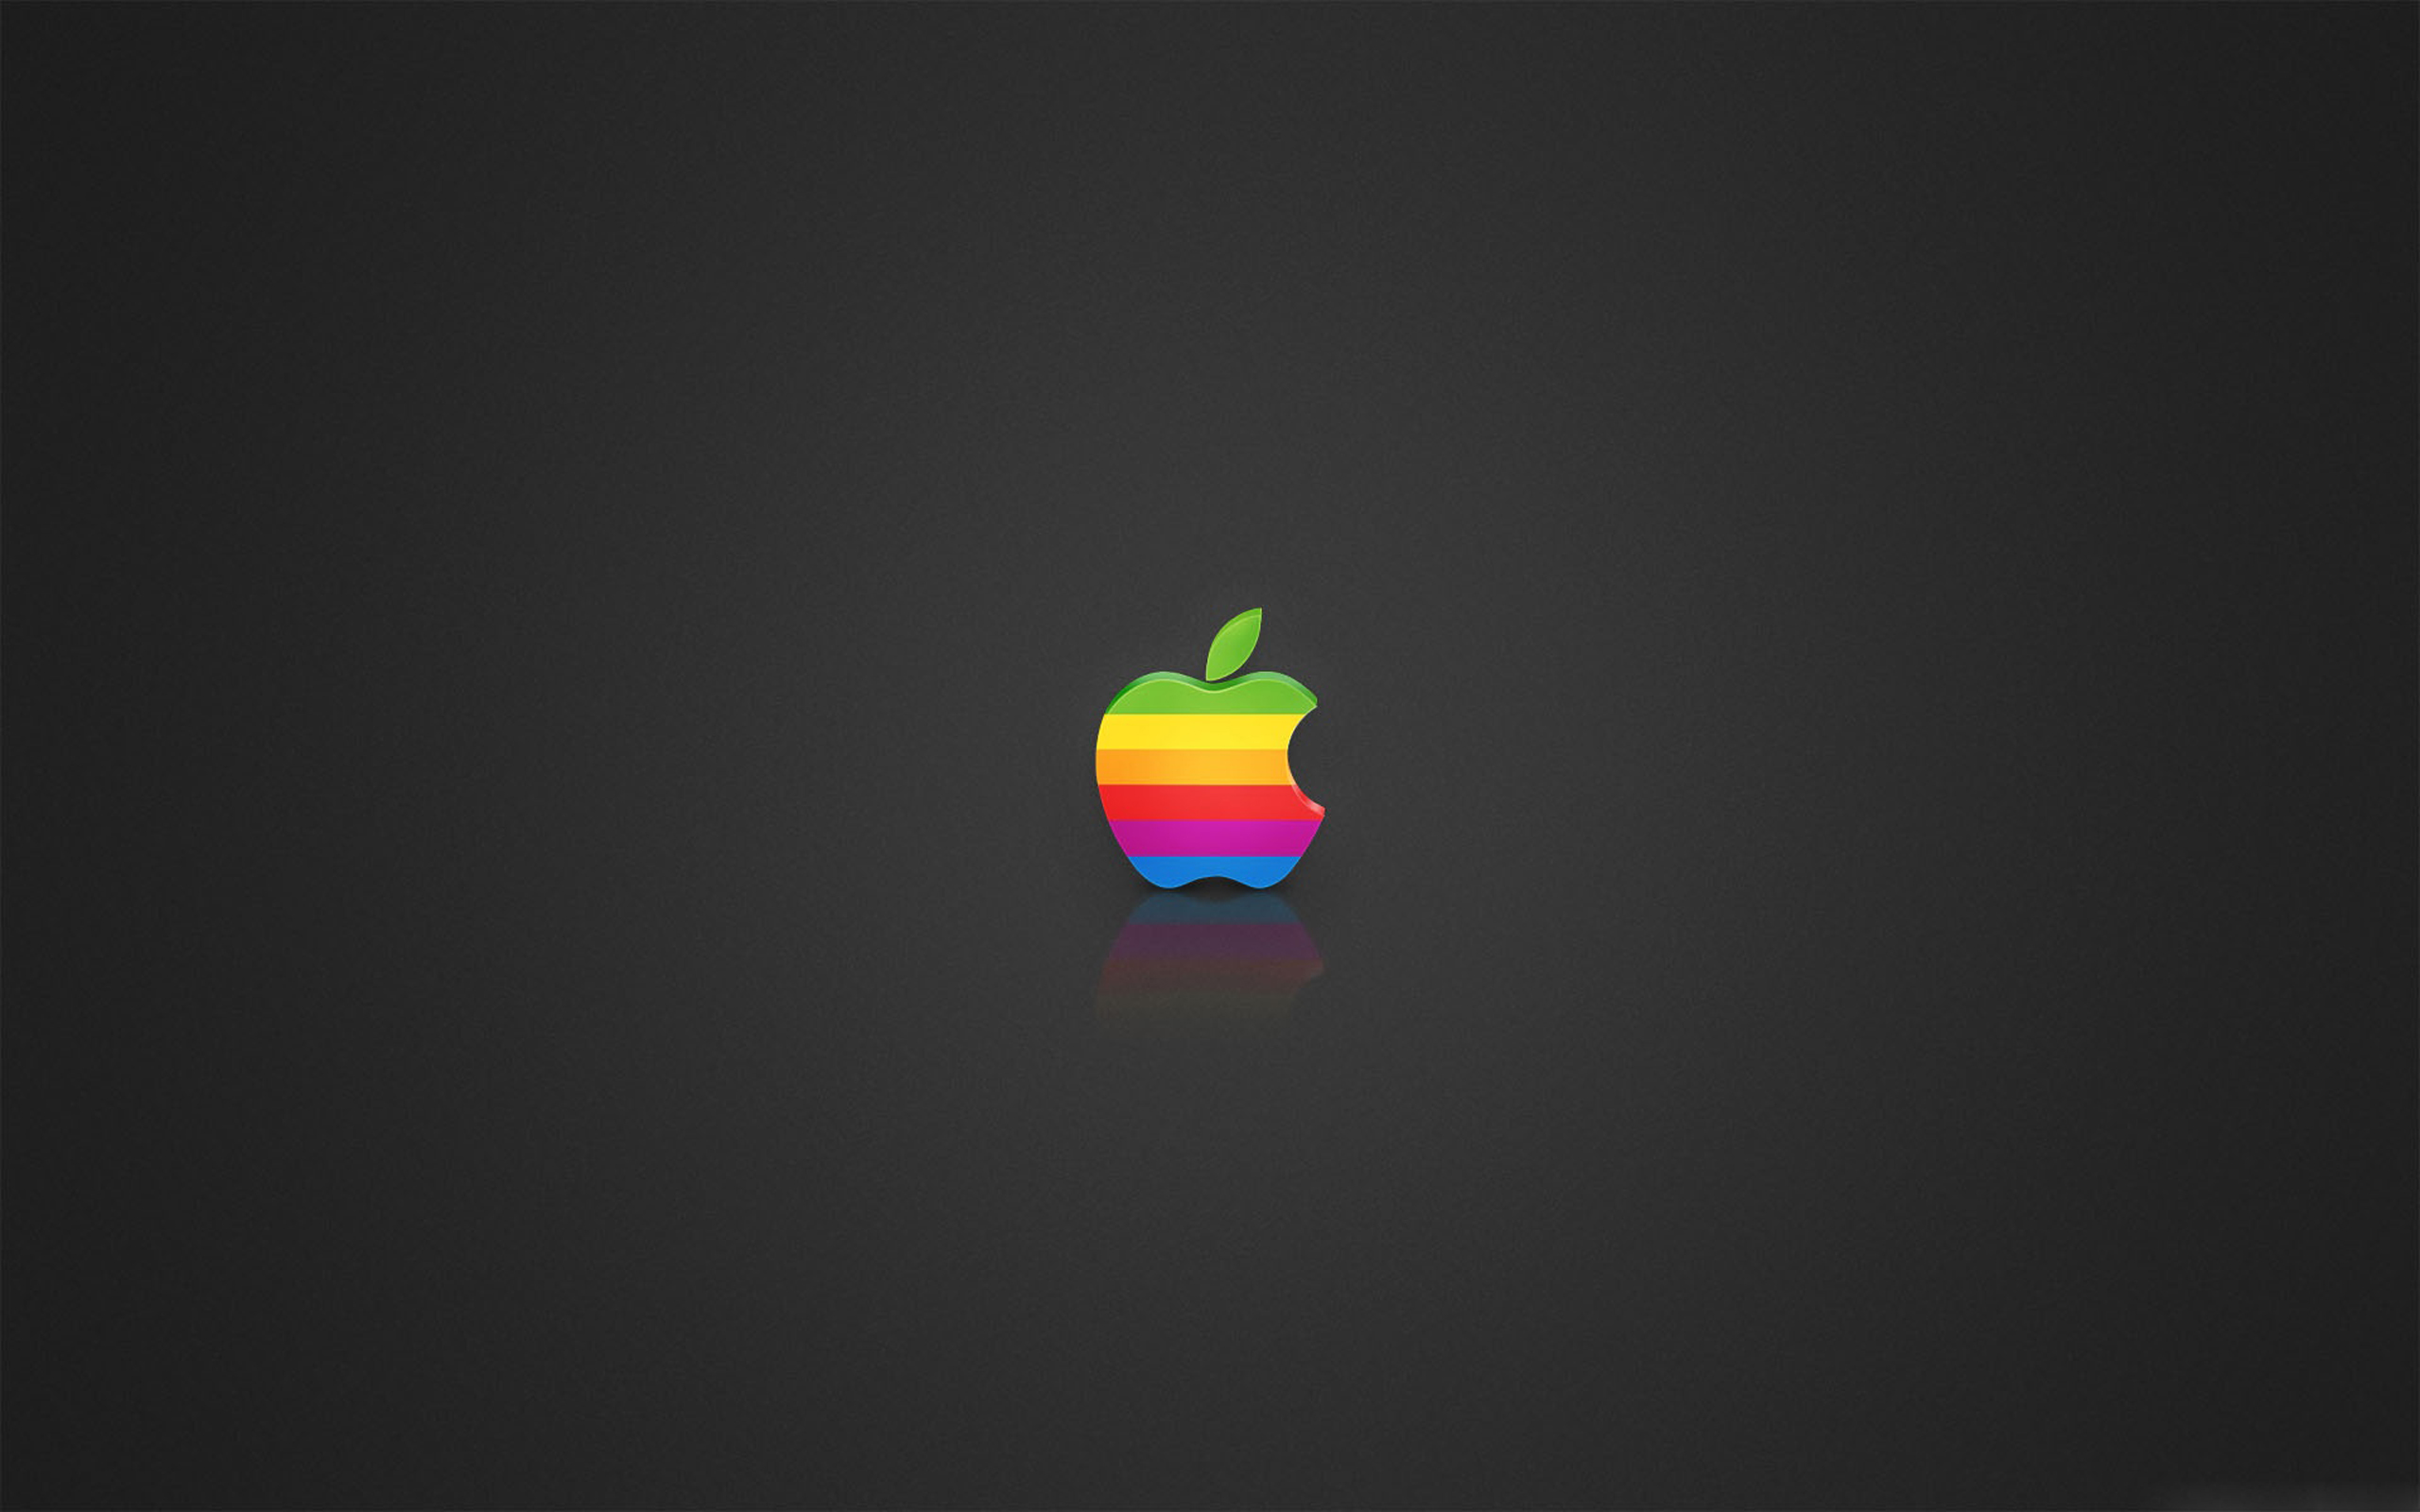 Backgrounds Computers Apple Mac Blot Desktop Background Pictures 2560x1600